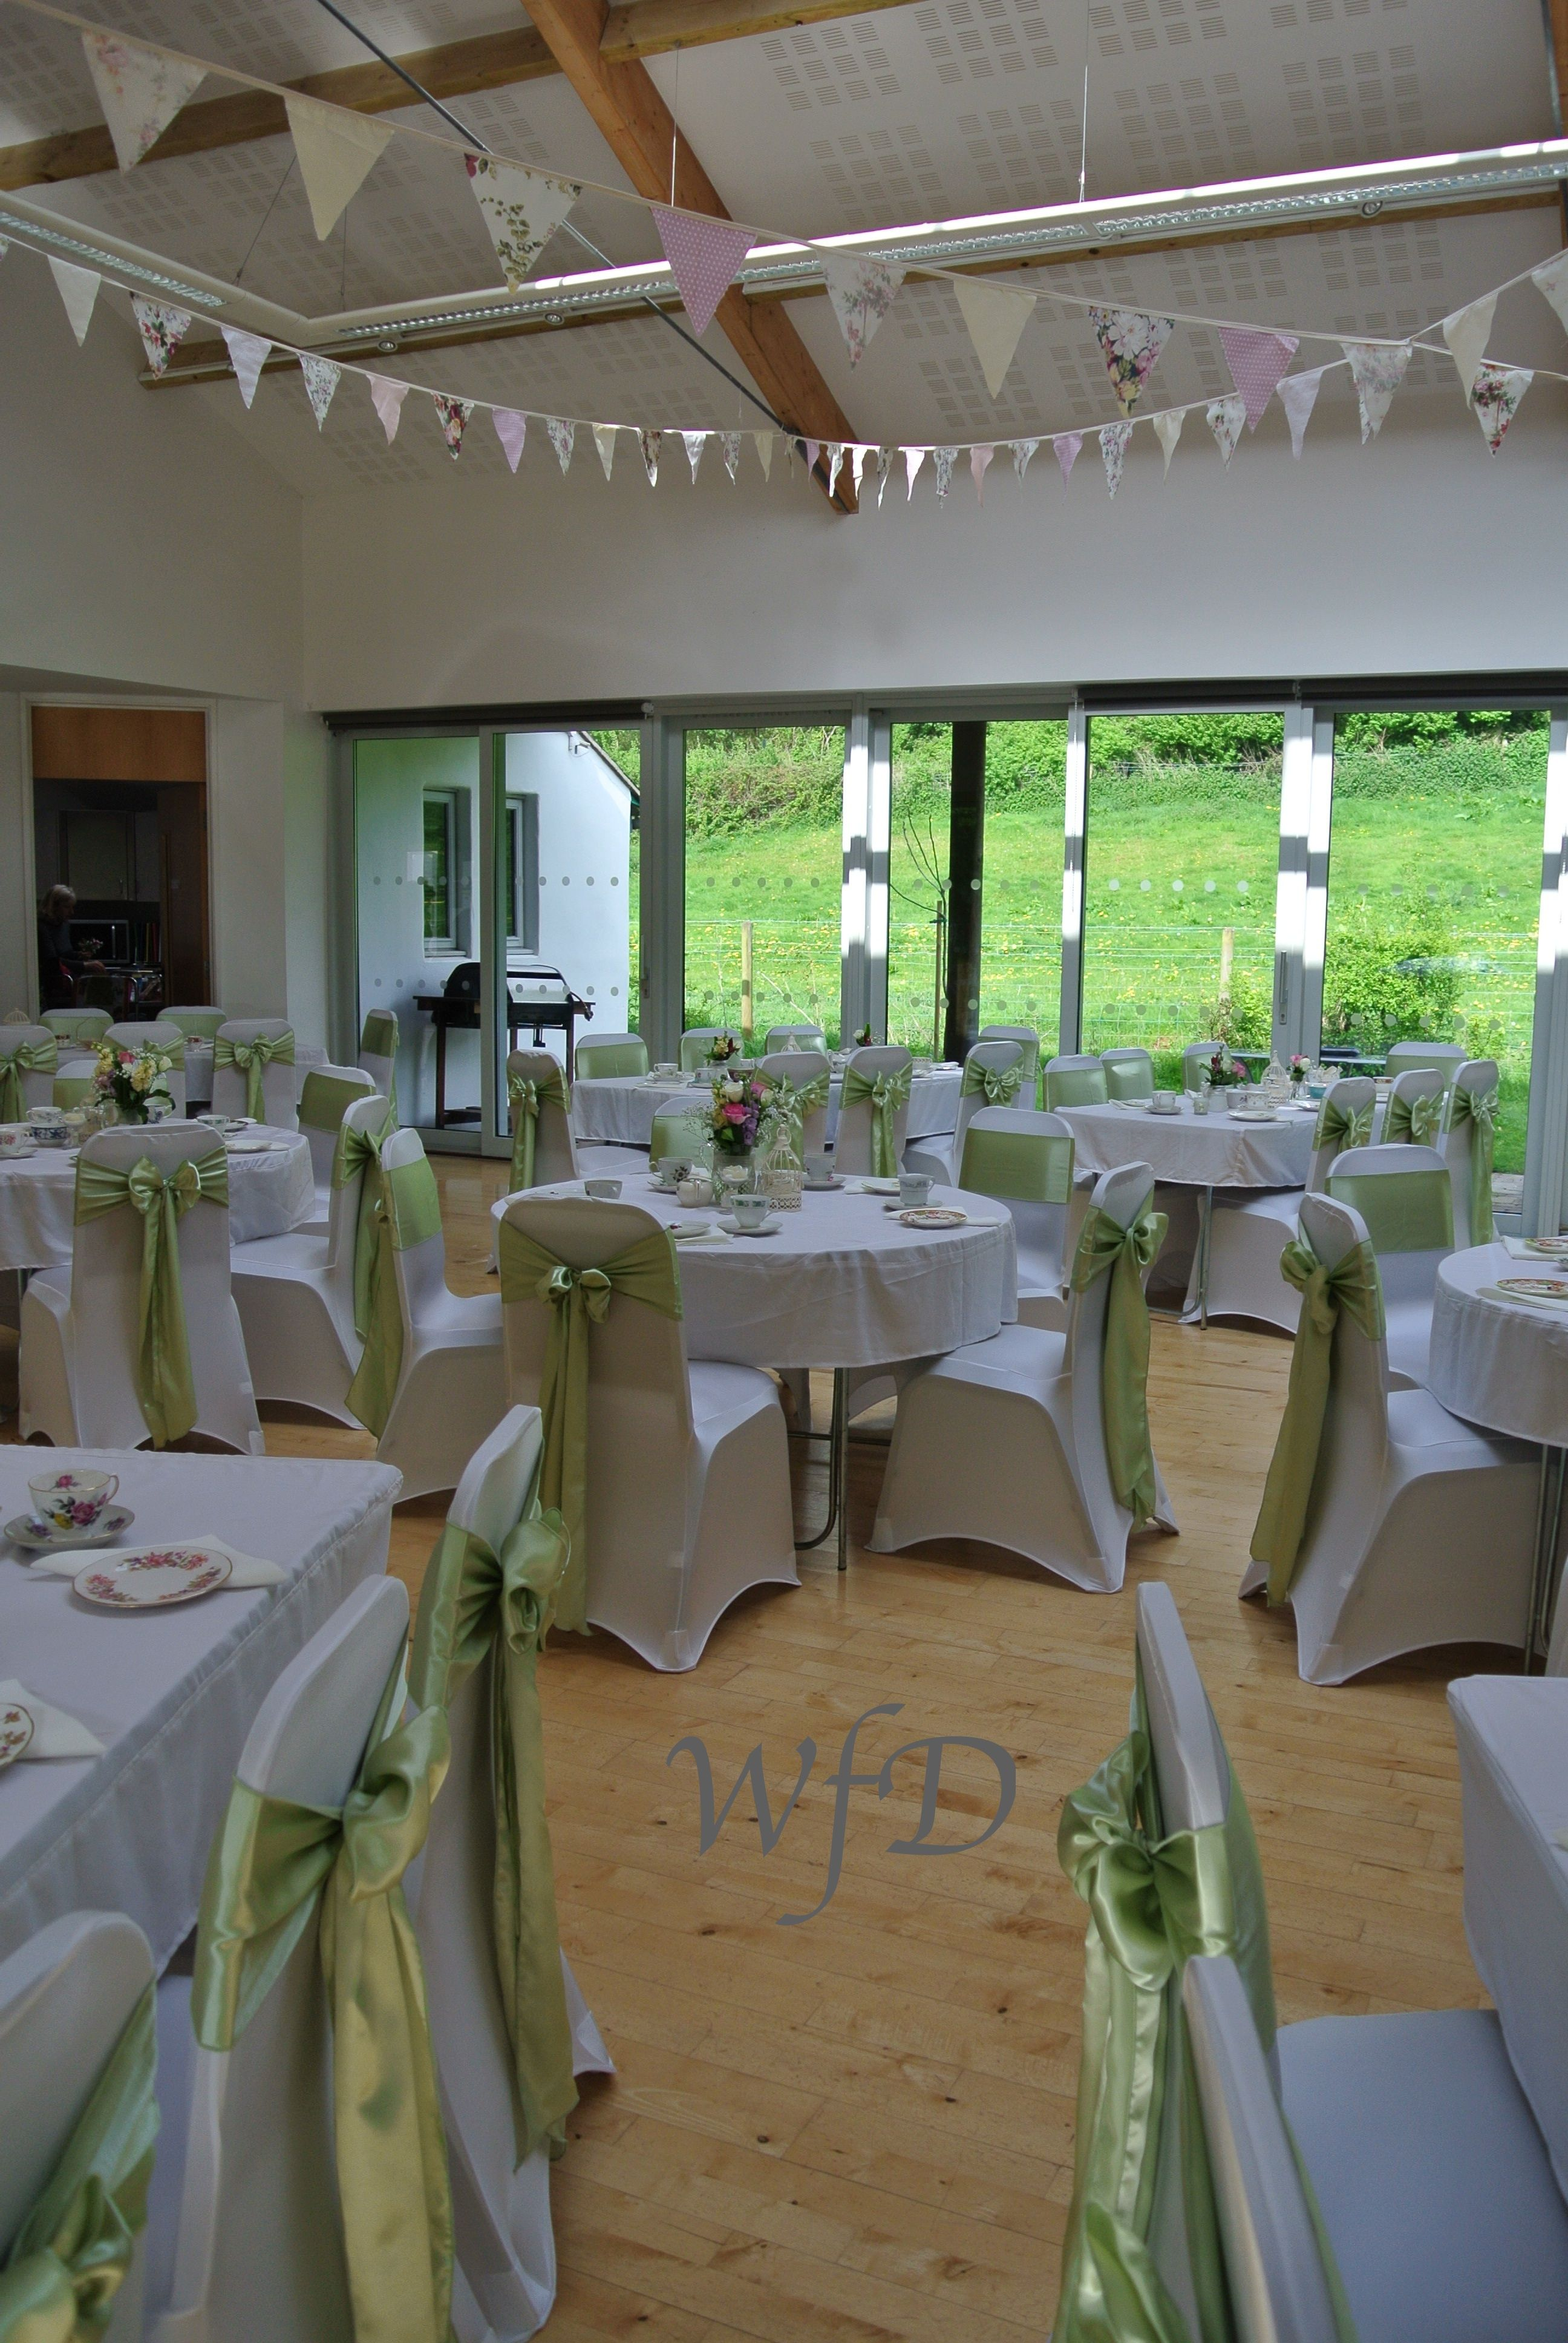 Wedding Chair Covers Devon Black Near Me Stokeinteignhead Village Hall Cover Sashes